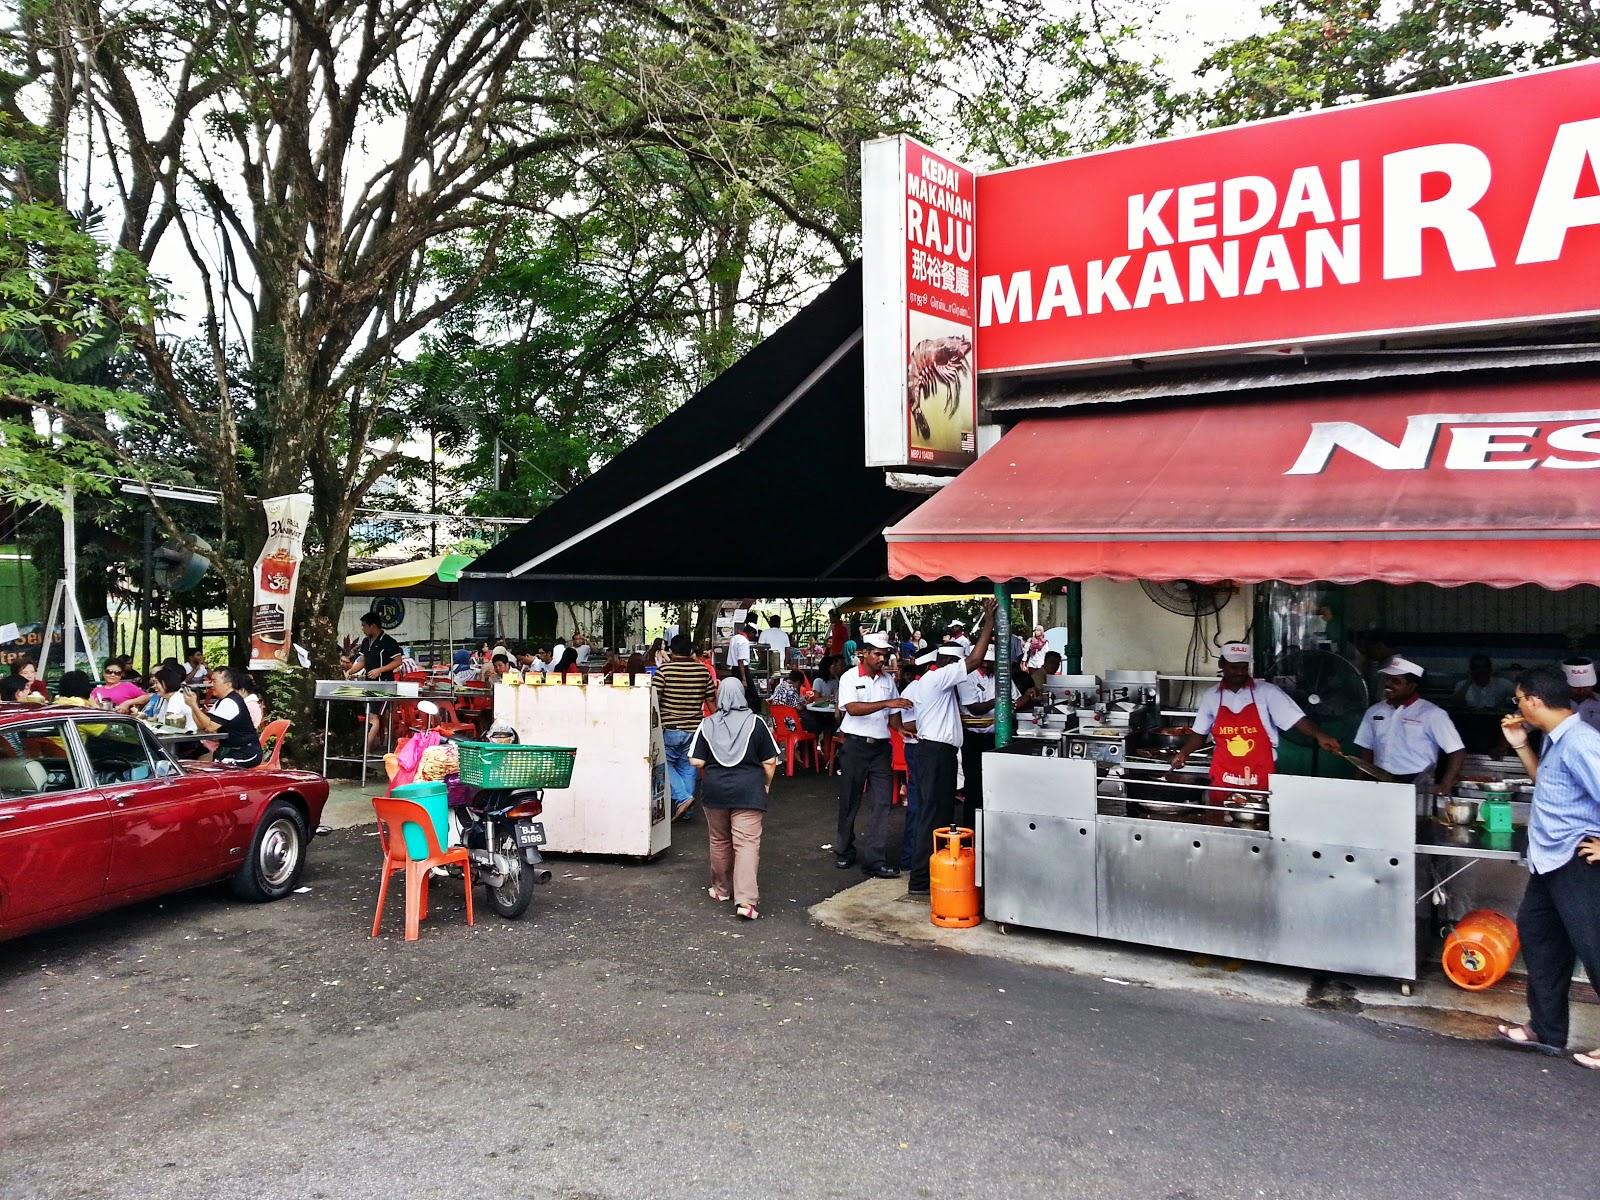 Kuala Lumpur Escorts and Sex Guide